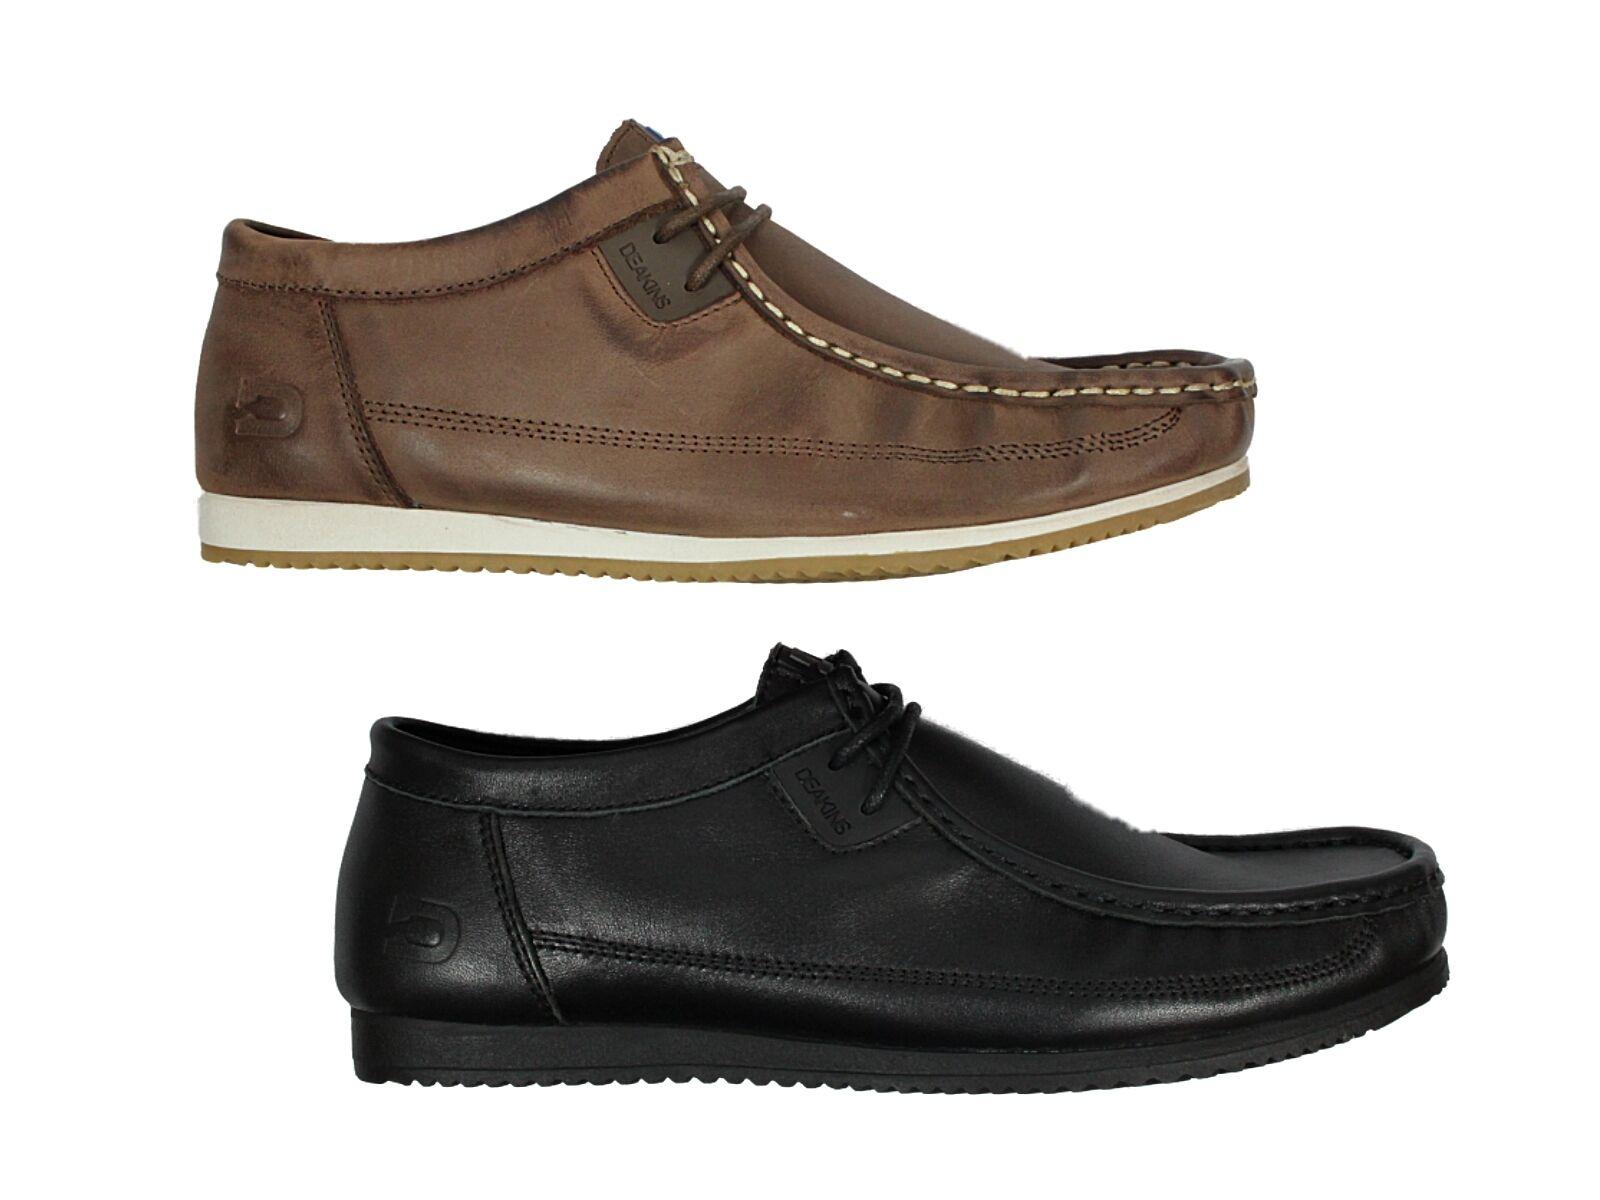 Herren LEATHER Schuhe NICHOLAS DEAKINS CONSUMER ALL BLACK BROWN SCHOOL OFFICE ALL CONSUMER SIZES 084597